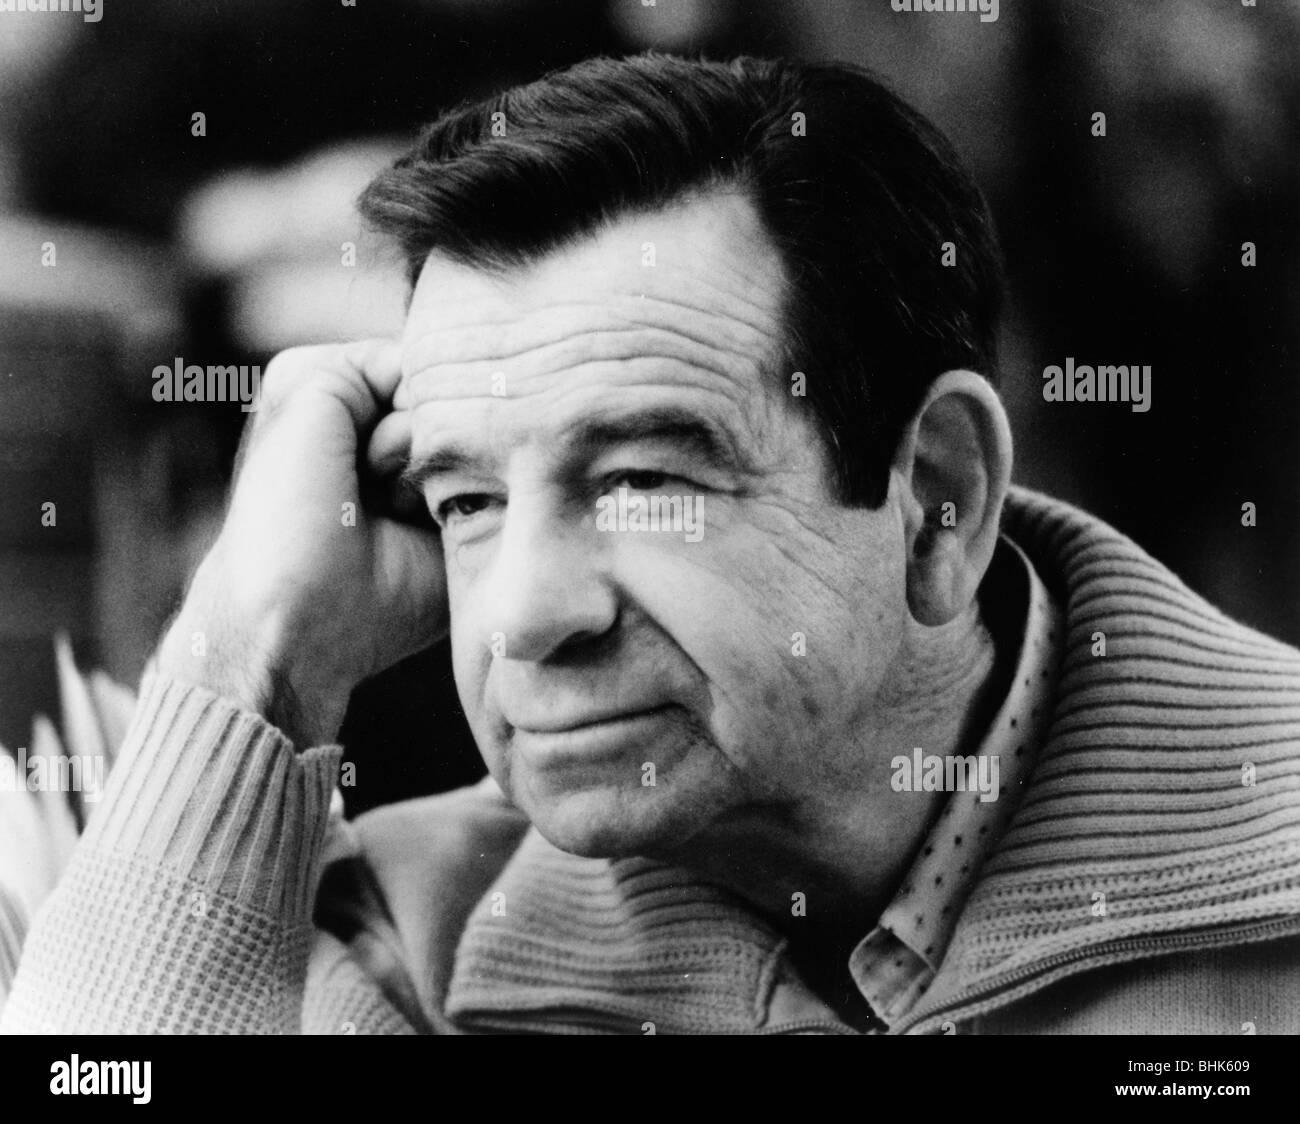 Walter Matthau (1920-2000), American actor. - Stock Image